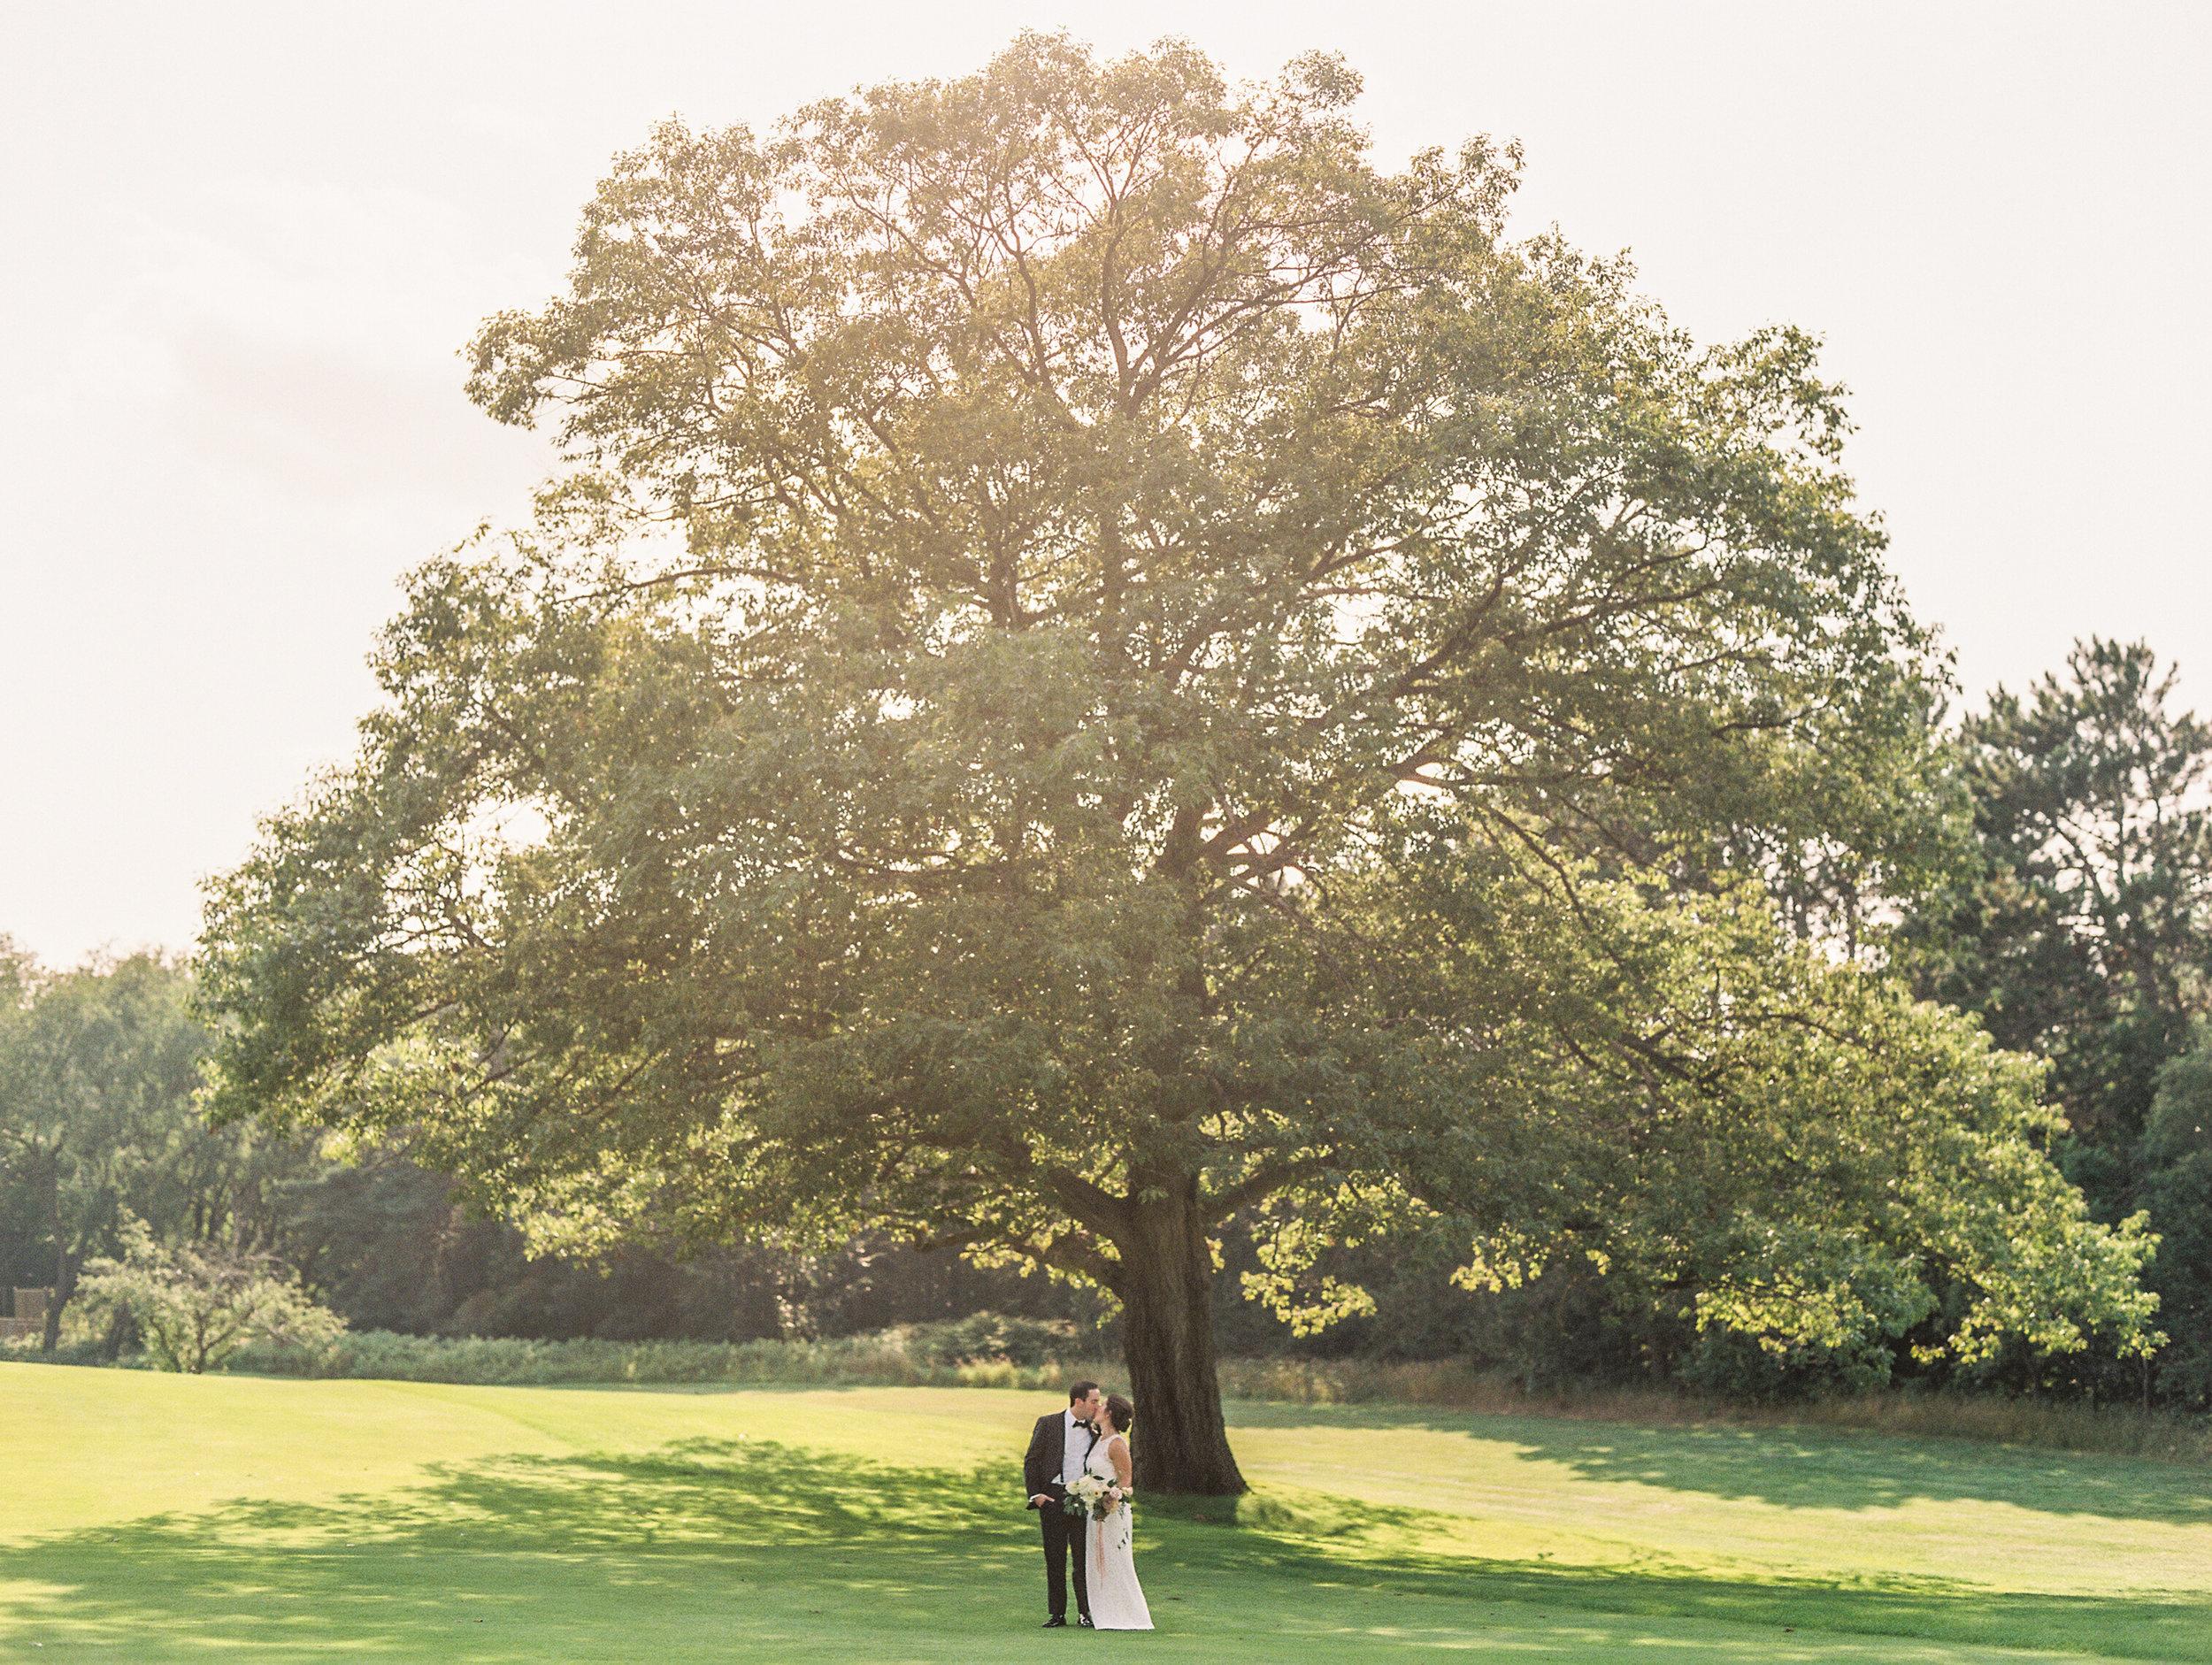 Zoller+Wedding+Reception+BridalPortraits-31.jpg